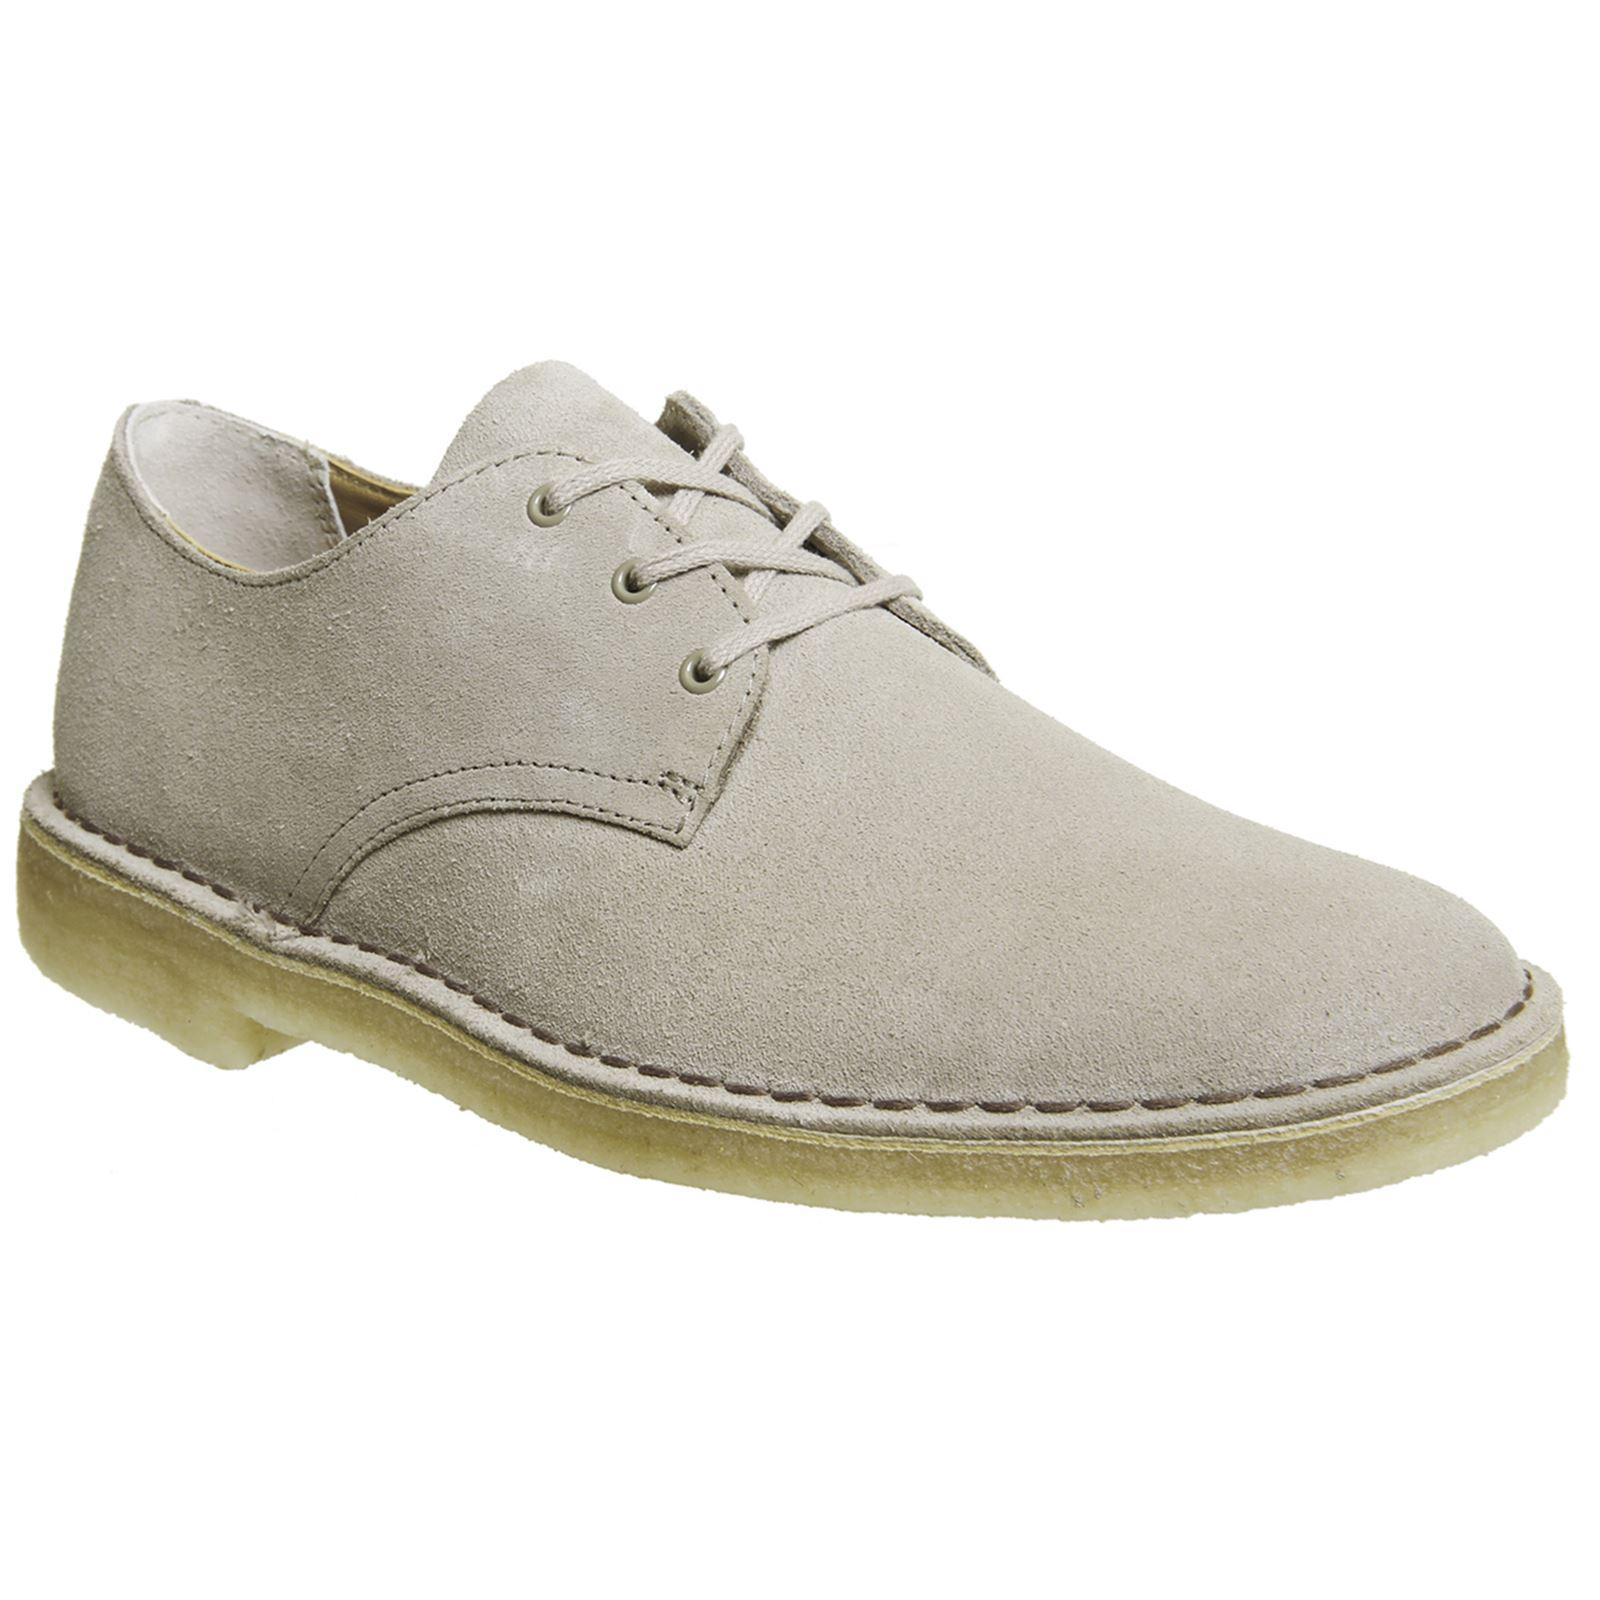 fdc99fe9fd26bc Clarks Originals Desert Crosby Sand Mens Suede Derby Low-Profile Shoes